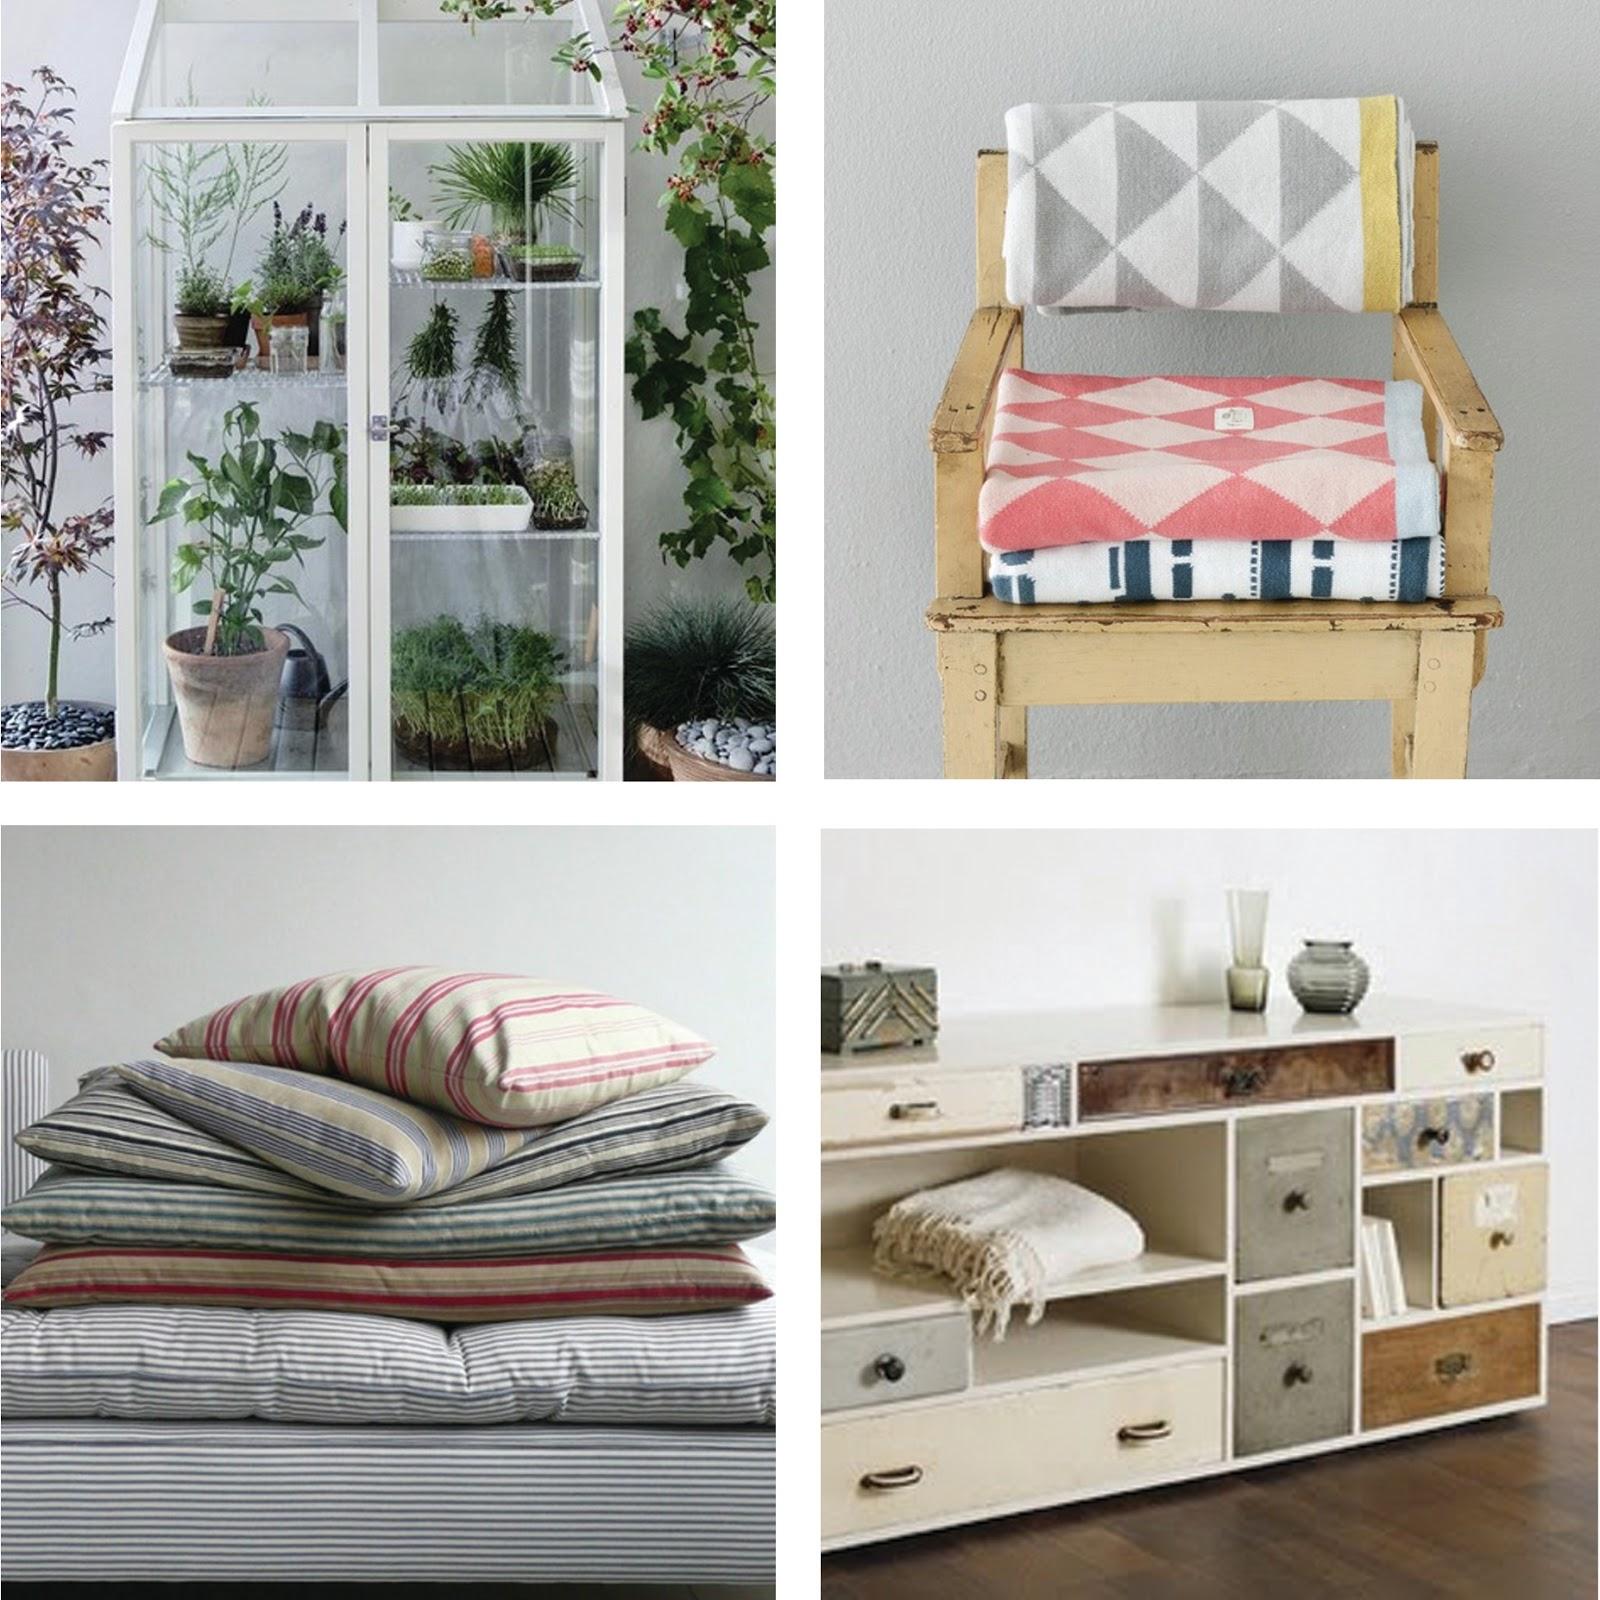 Ideas Practicas - Cosas Practicas Para Casa - Mimasku.com